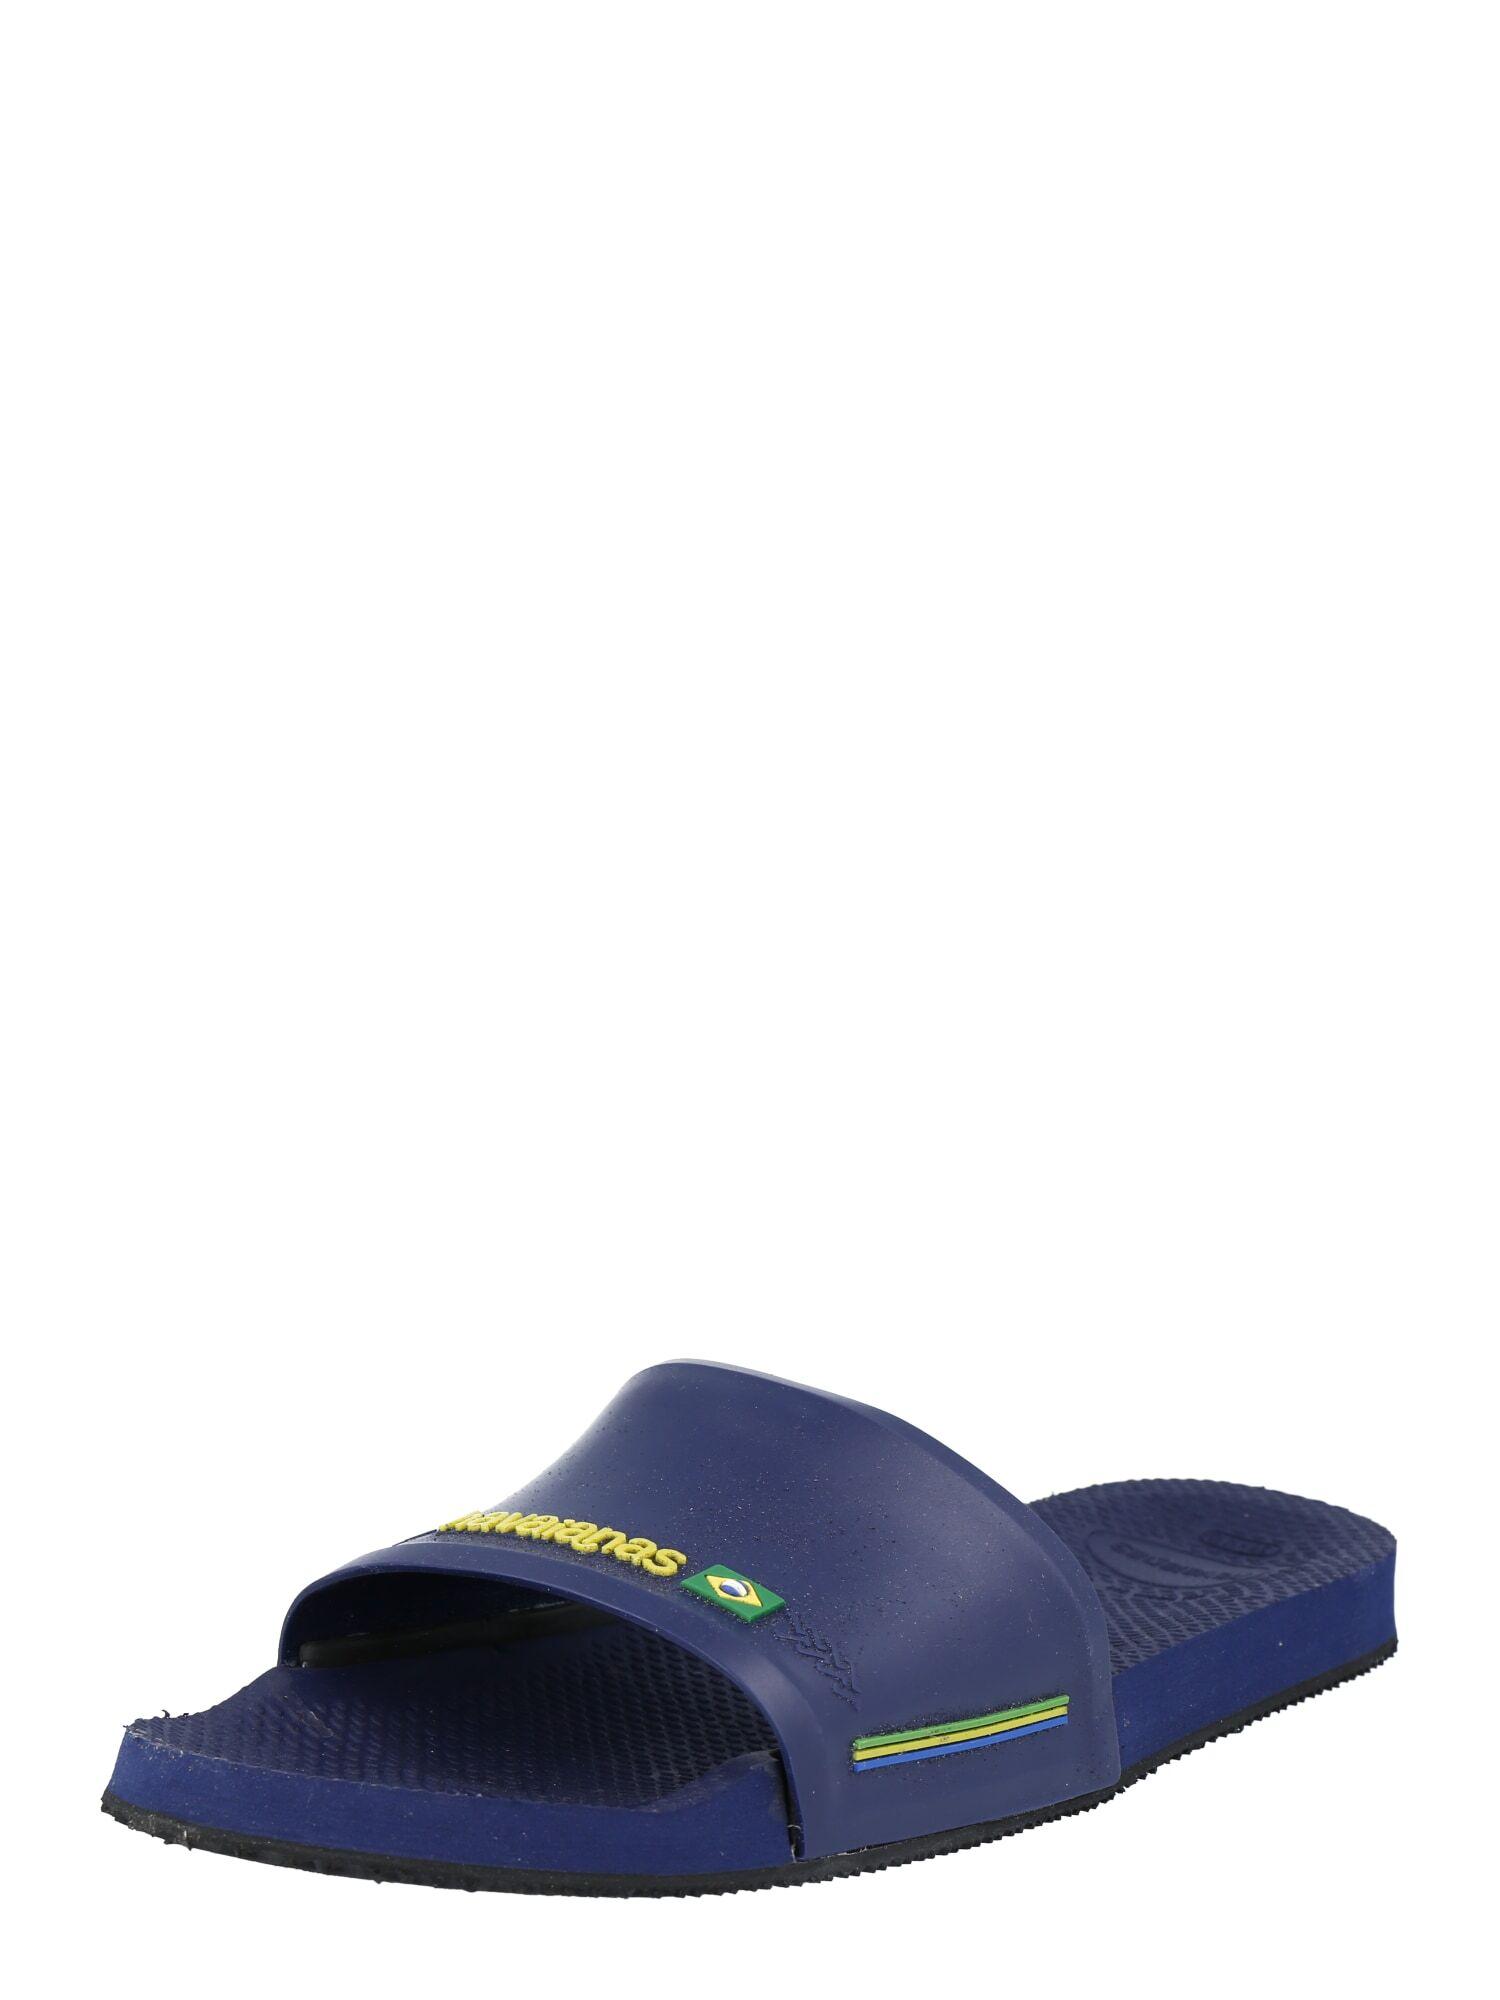 HAVAIANAS Mule 'Slide Brasil'  - Bleu - Taille: 43-44 - male